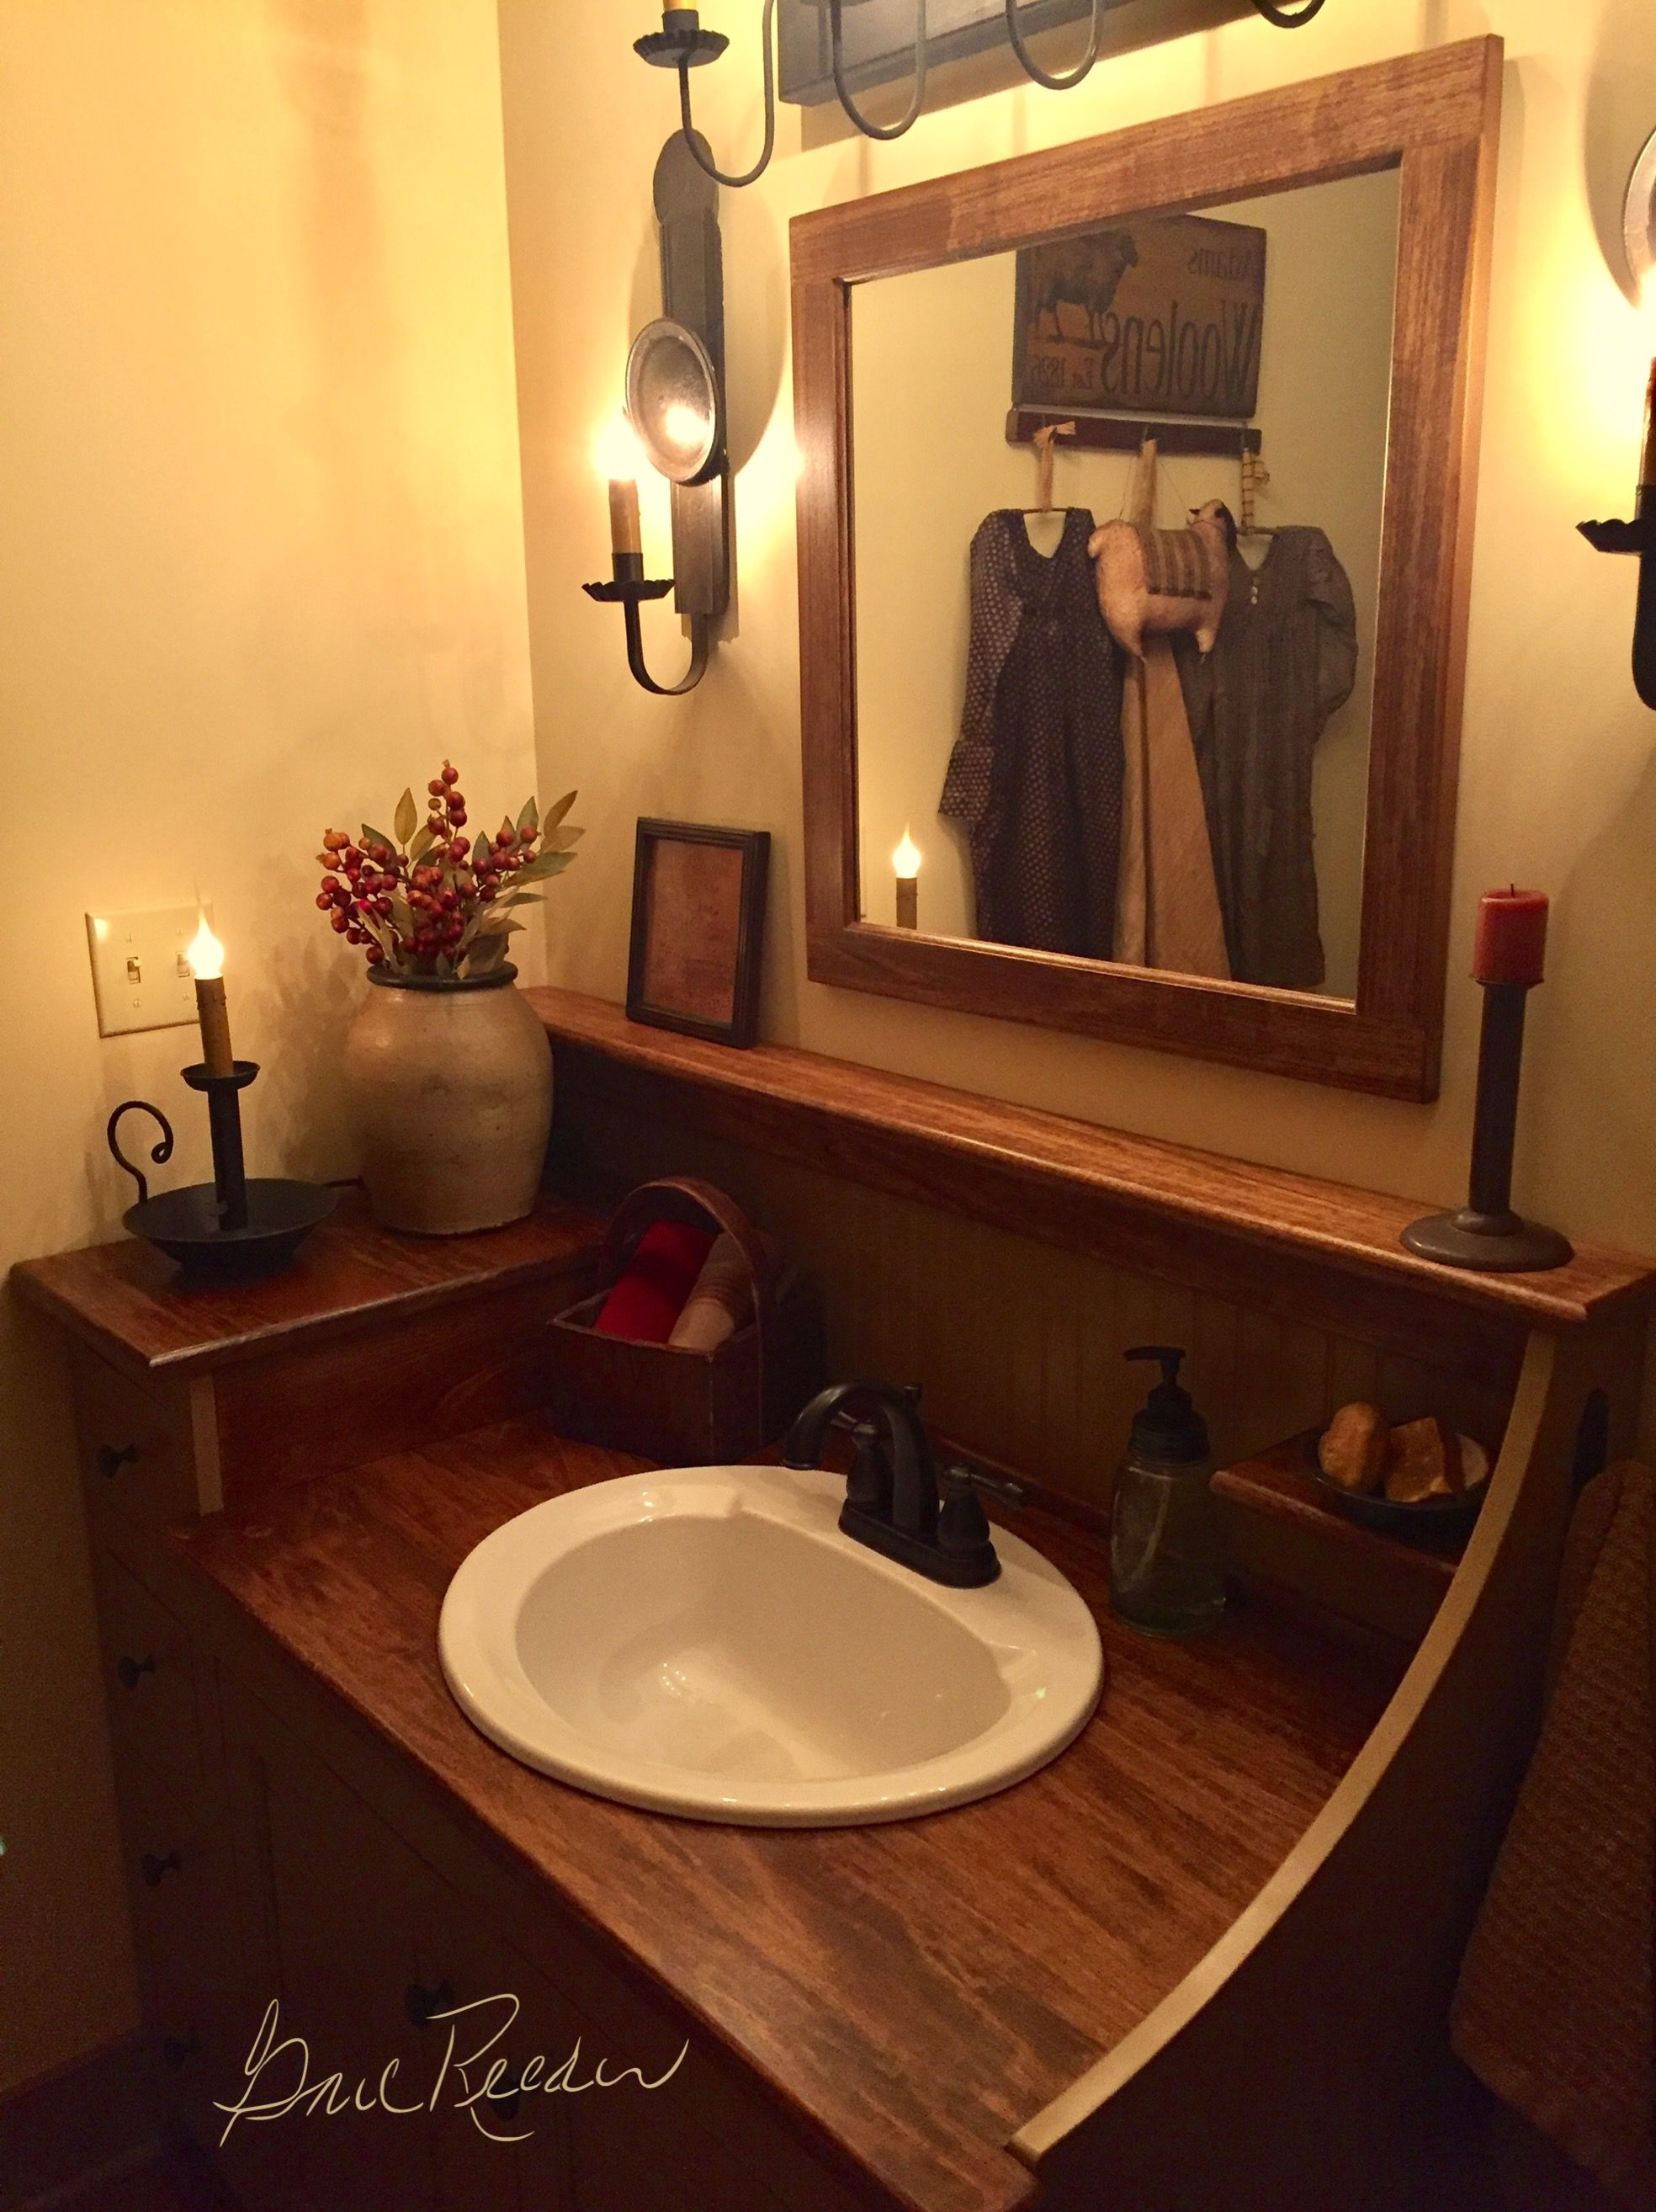 Pin By Rachaelbarlow On My Home Sweet Home Primitive Bathroom